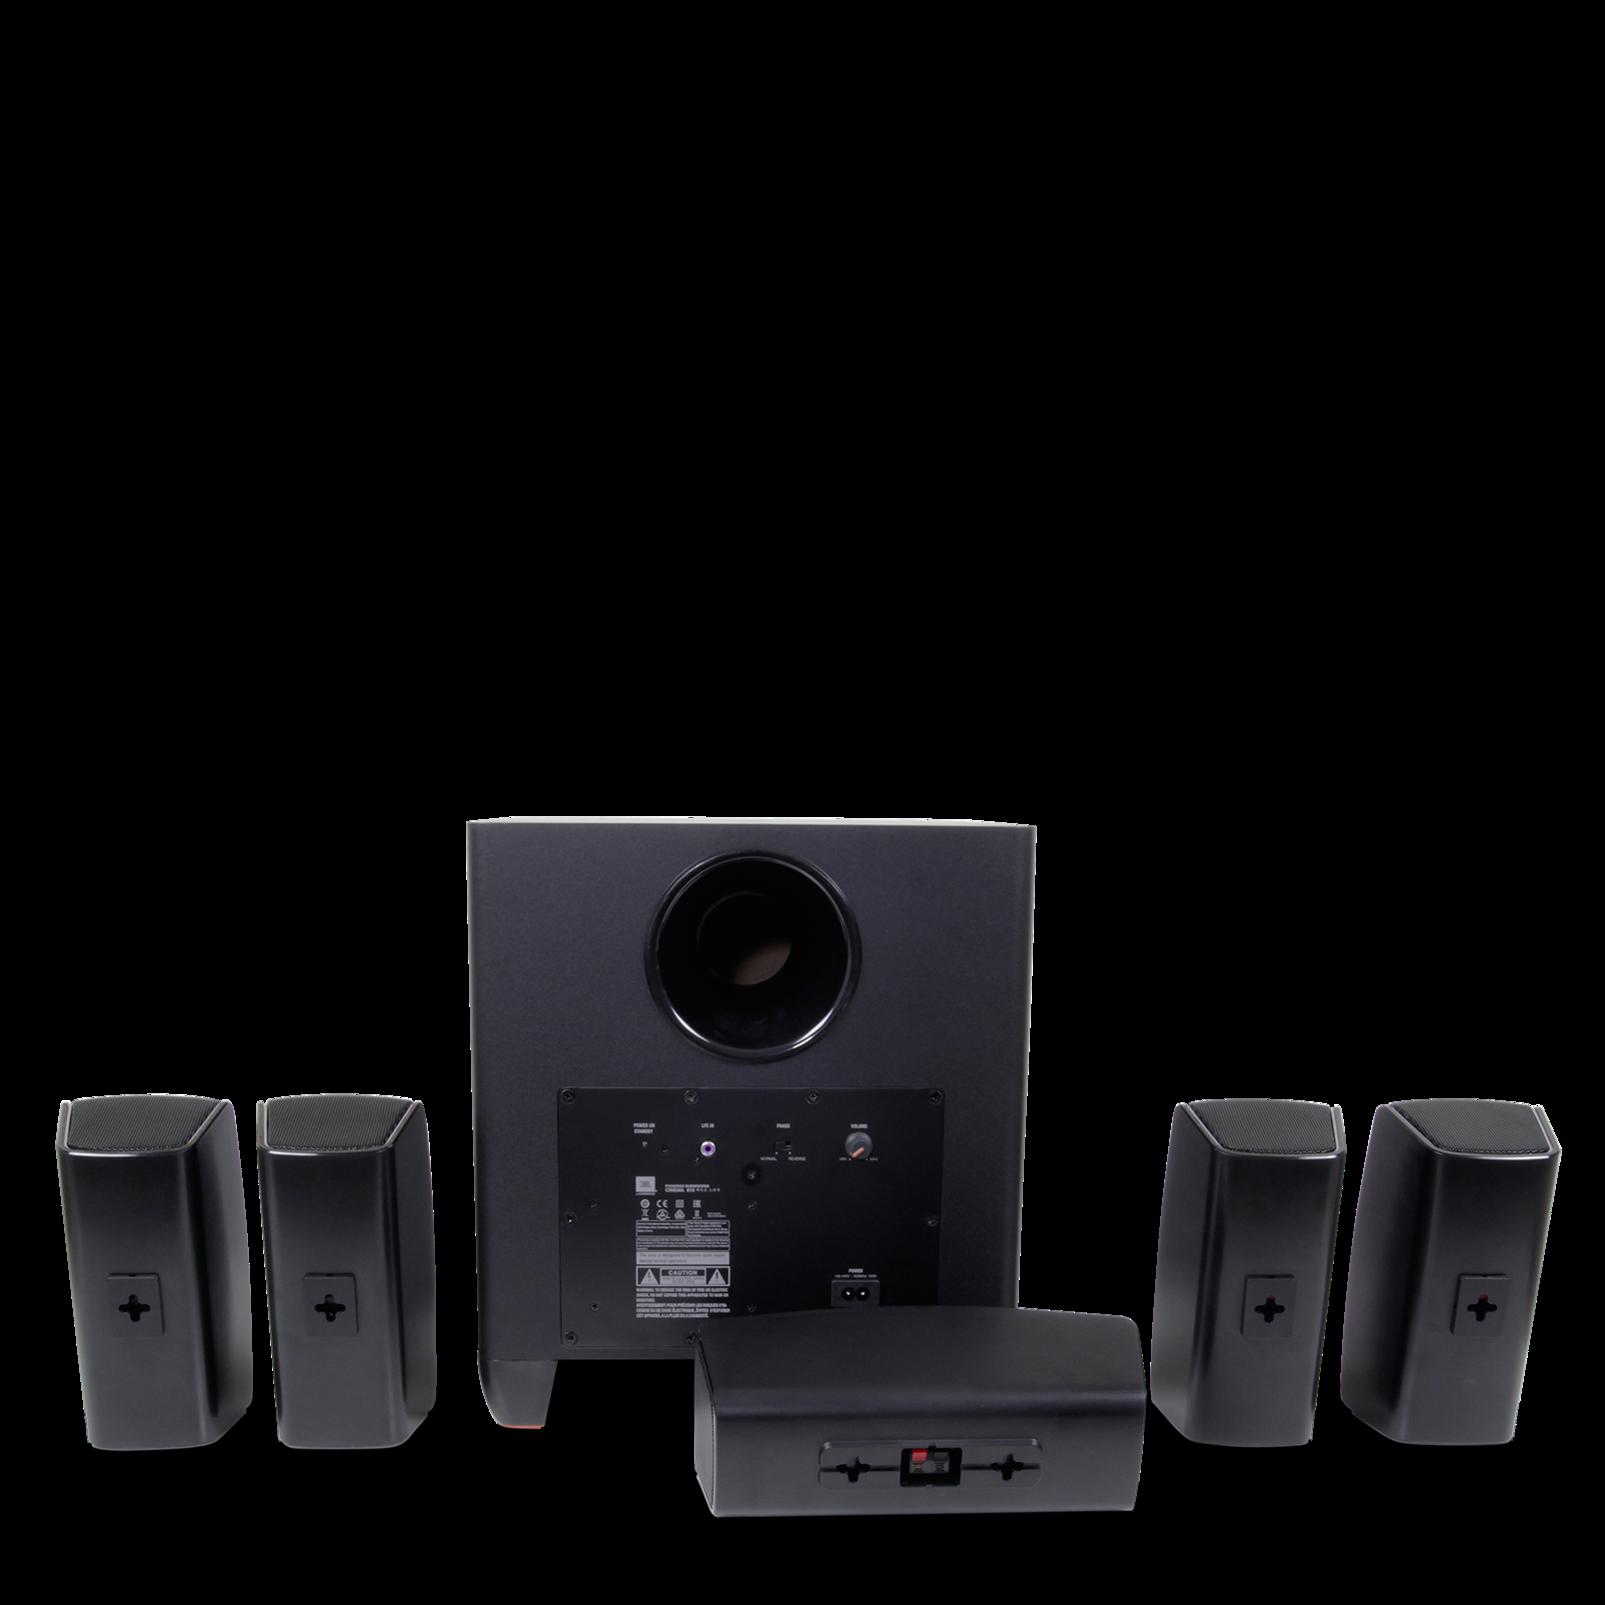 Jbl Cinema 610 Advanced 51 Speaker System Gauge 3000 W Watt Amp Amplifier Wiring Kit O Awg Car Audio Install